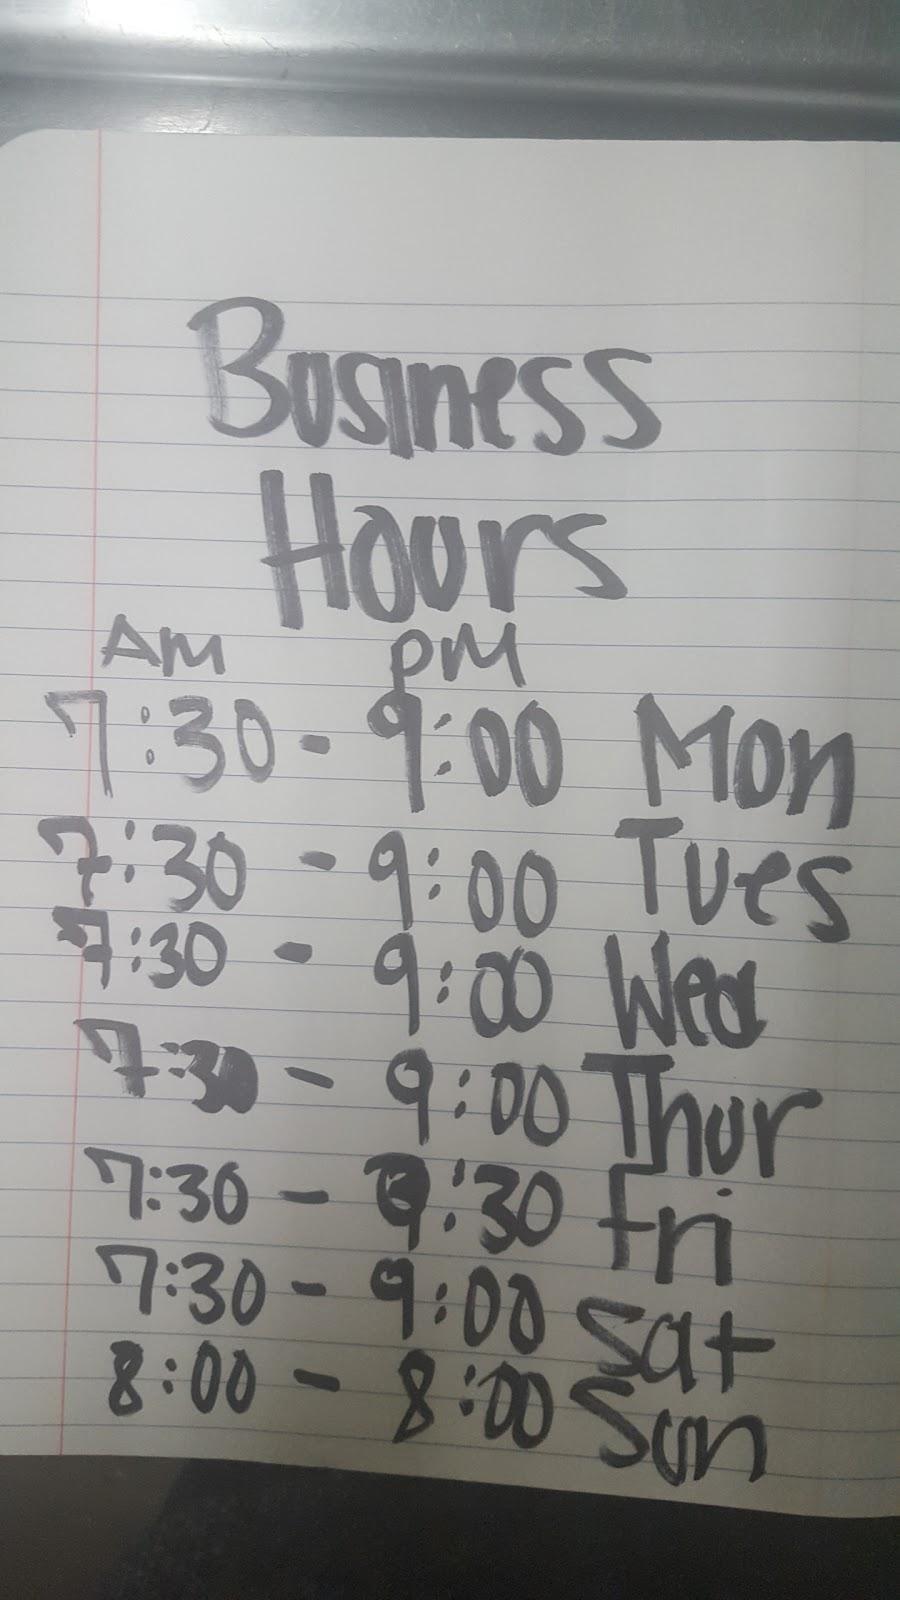 Las Tres Princesas Bakery - bakery  | Photo 7 of 7 | Address: 2736 N Bristol St, Santa Ana, CA 92706, USA | Phone: (714) 542-2131